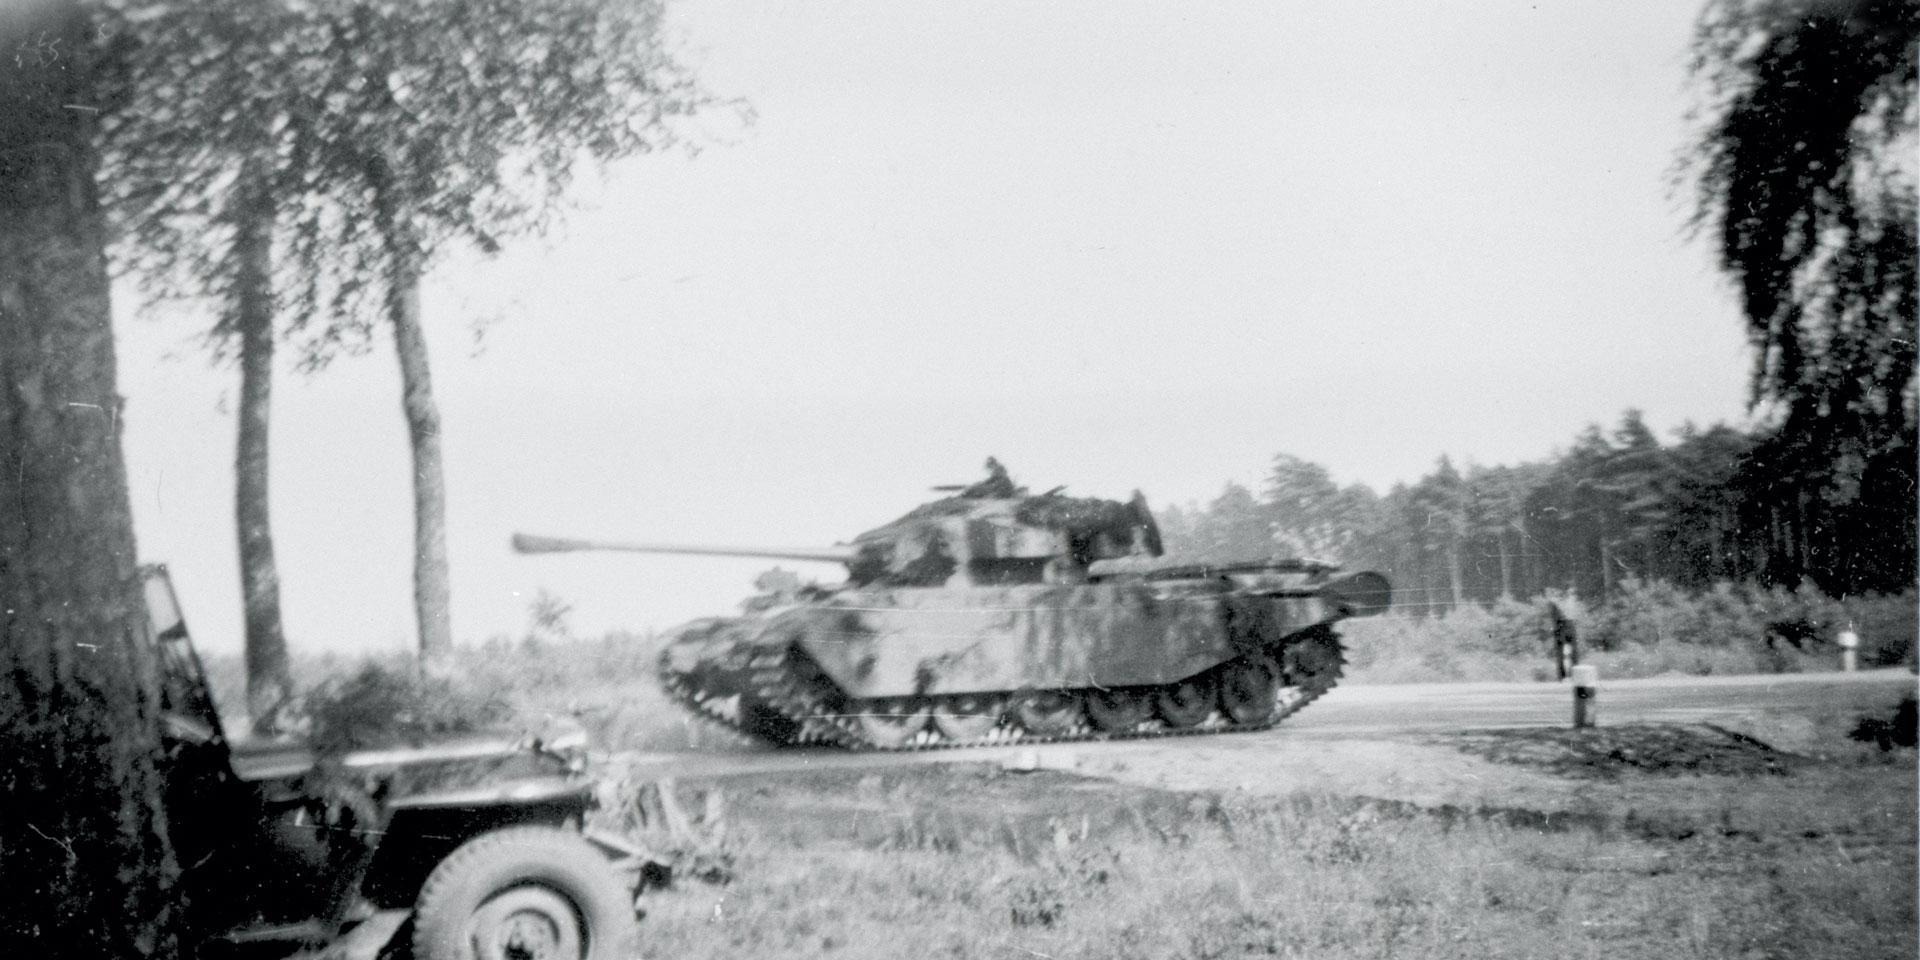 A BAOR Centurion tank on exercises near Bispingen, West Germany, 1953